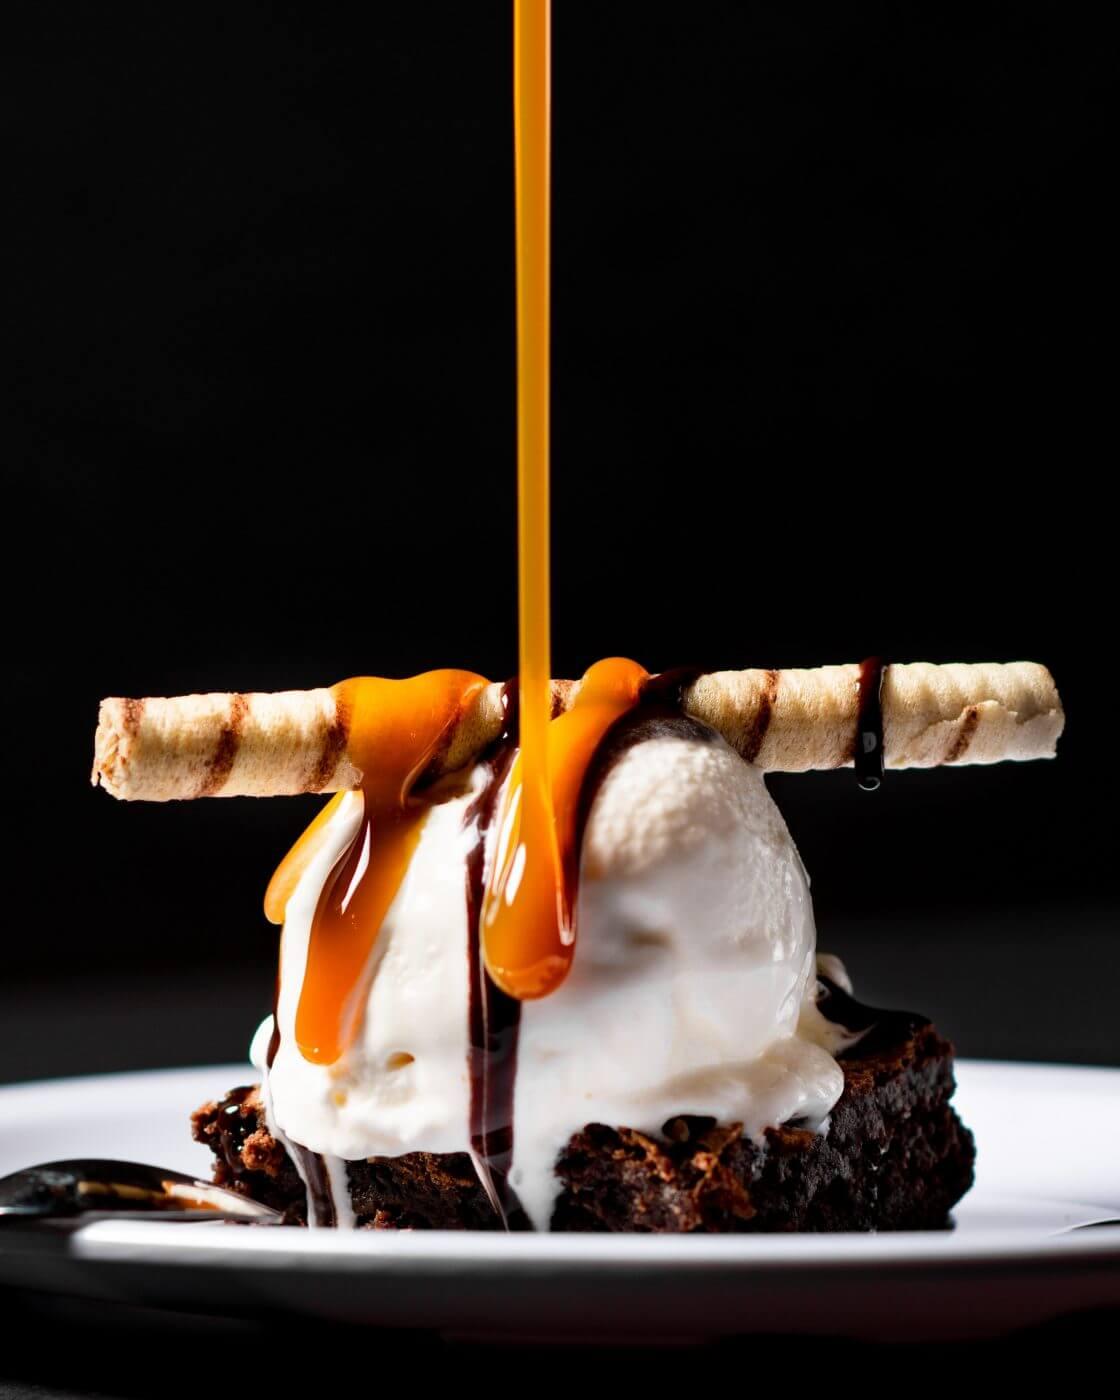 Vegan desserts class – how to make and stye